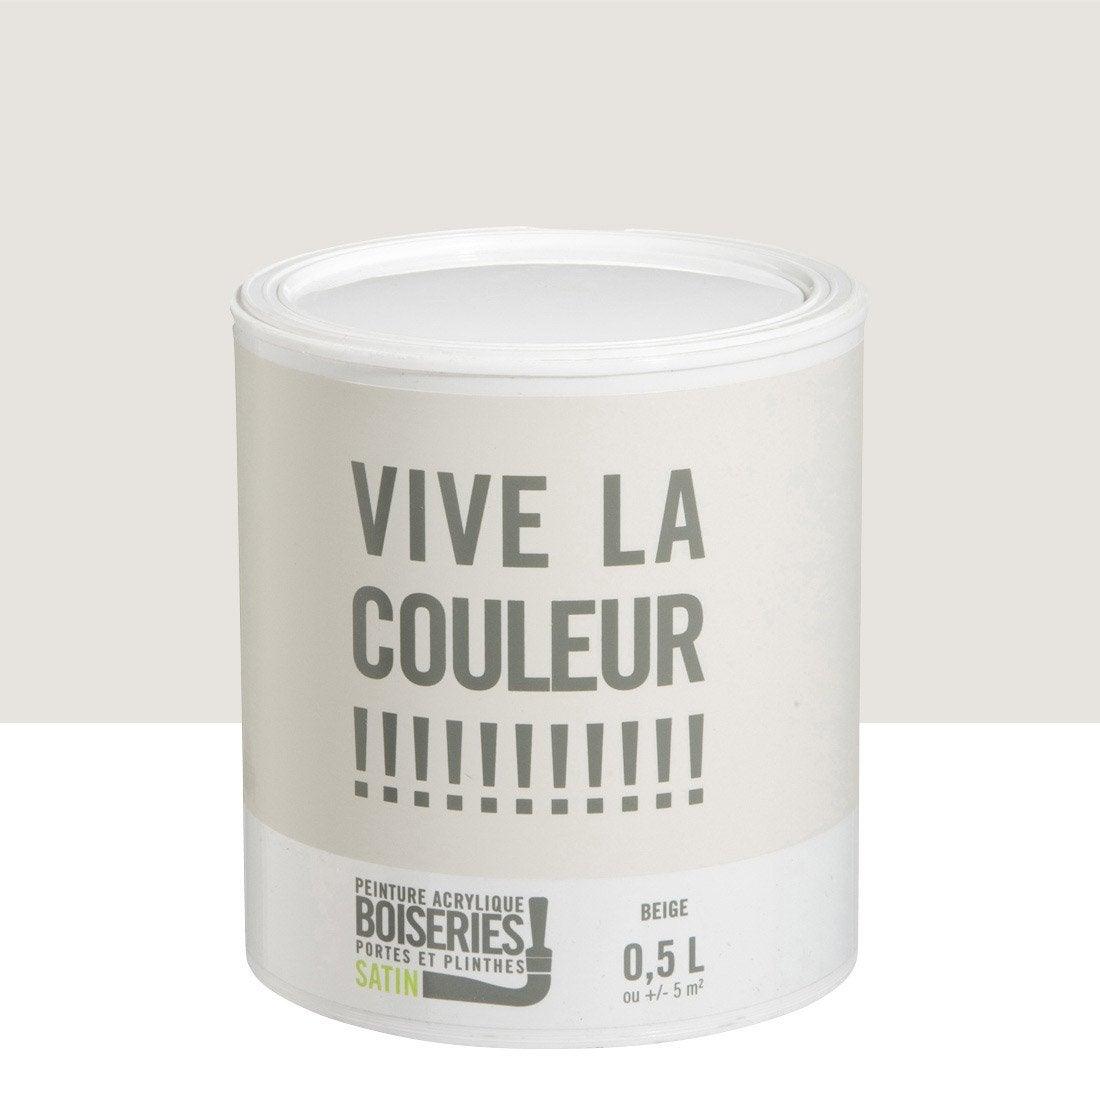 peinture boiserie vive la couleur beige 0 5 l leroy merlin. Black Bedroom Furniture Sets. Home Design Ideas